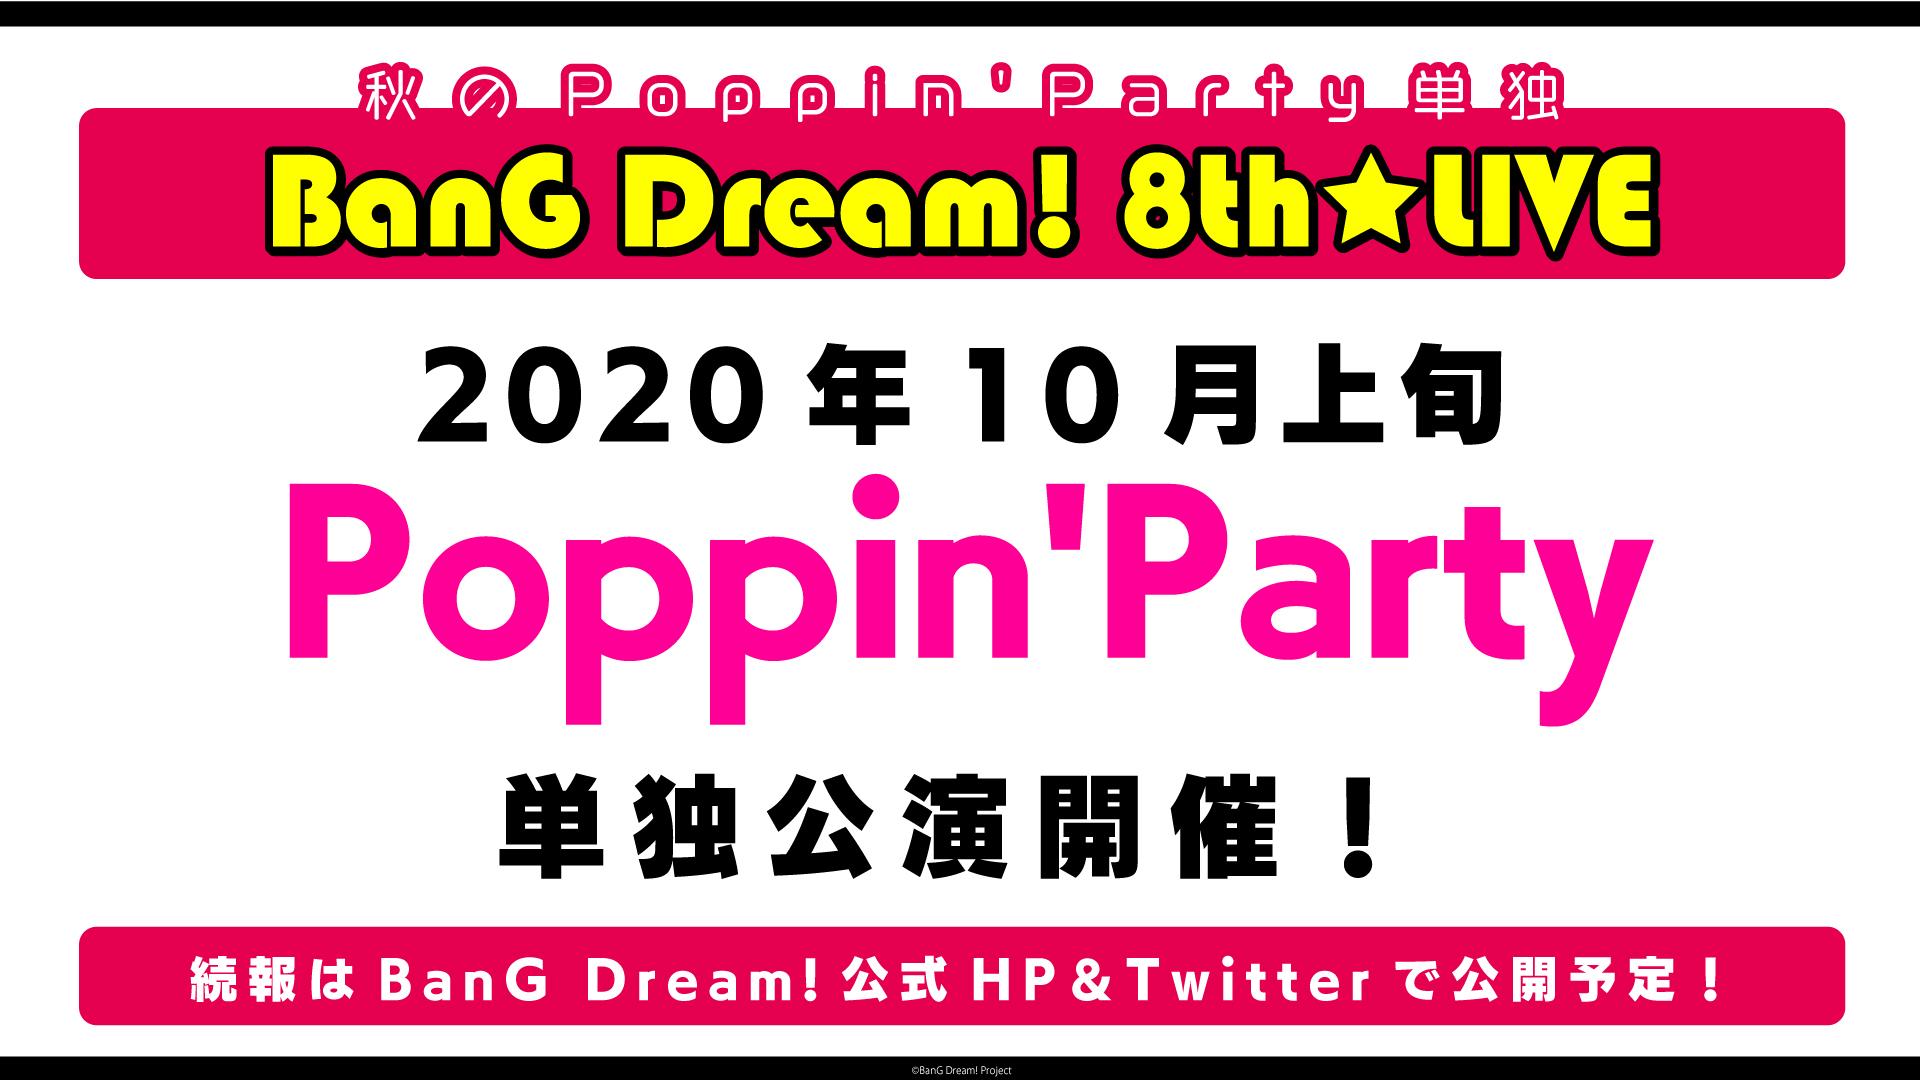 bang_dream_info 1201082016650780674_p0